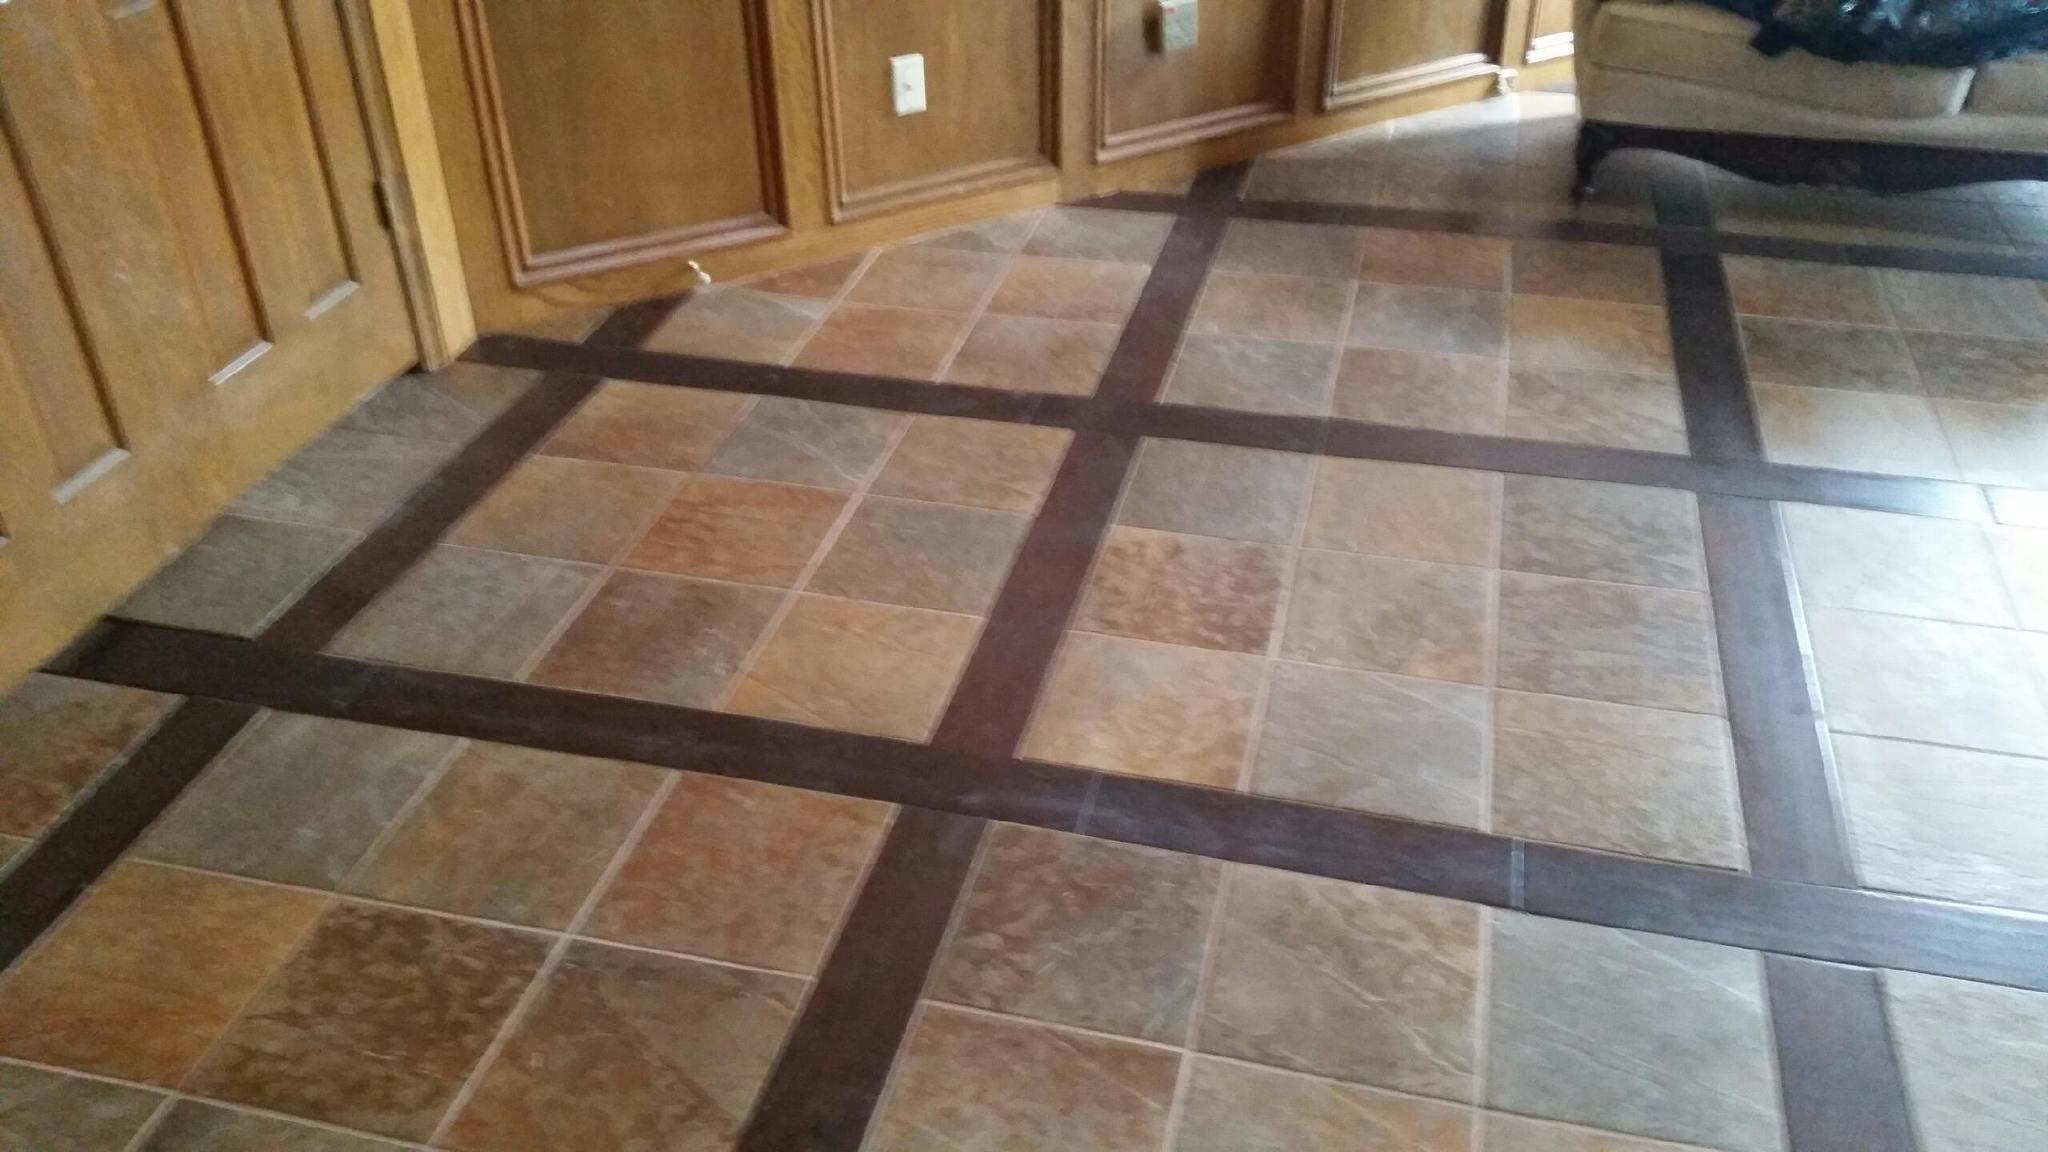 Wood floor tiles over carpet bathroom tile and wood for 100 floors floor 62